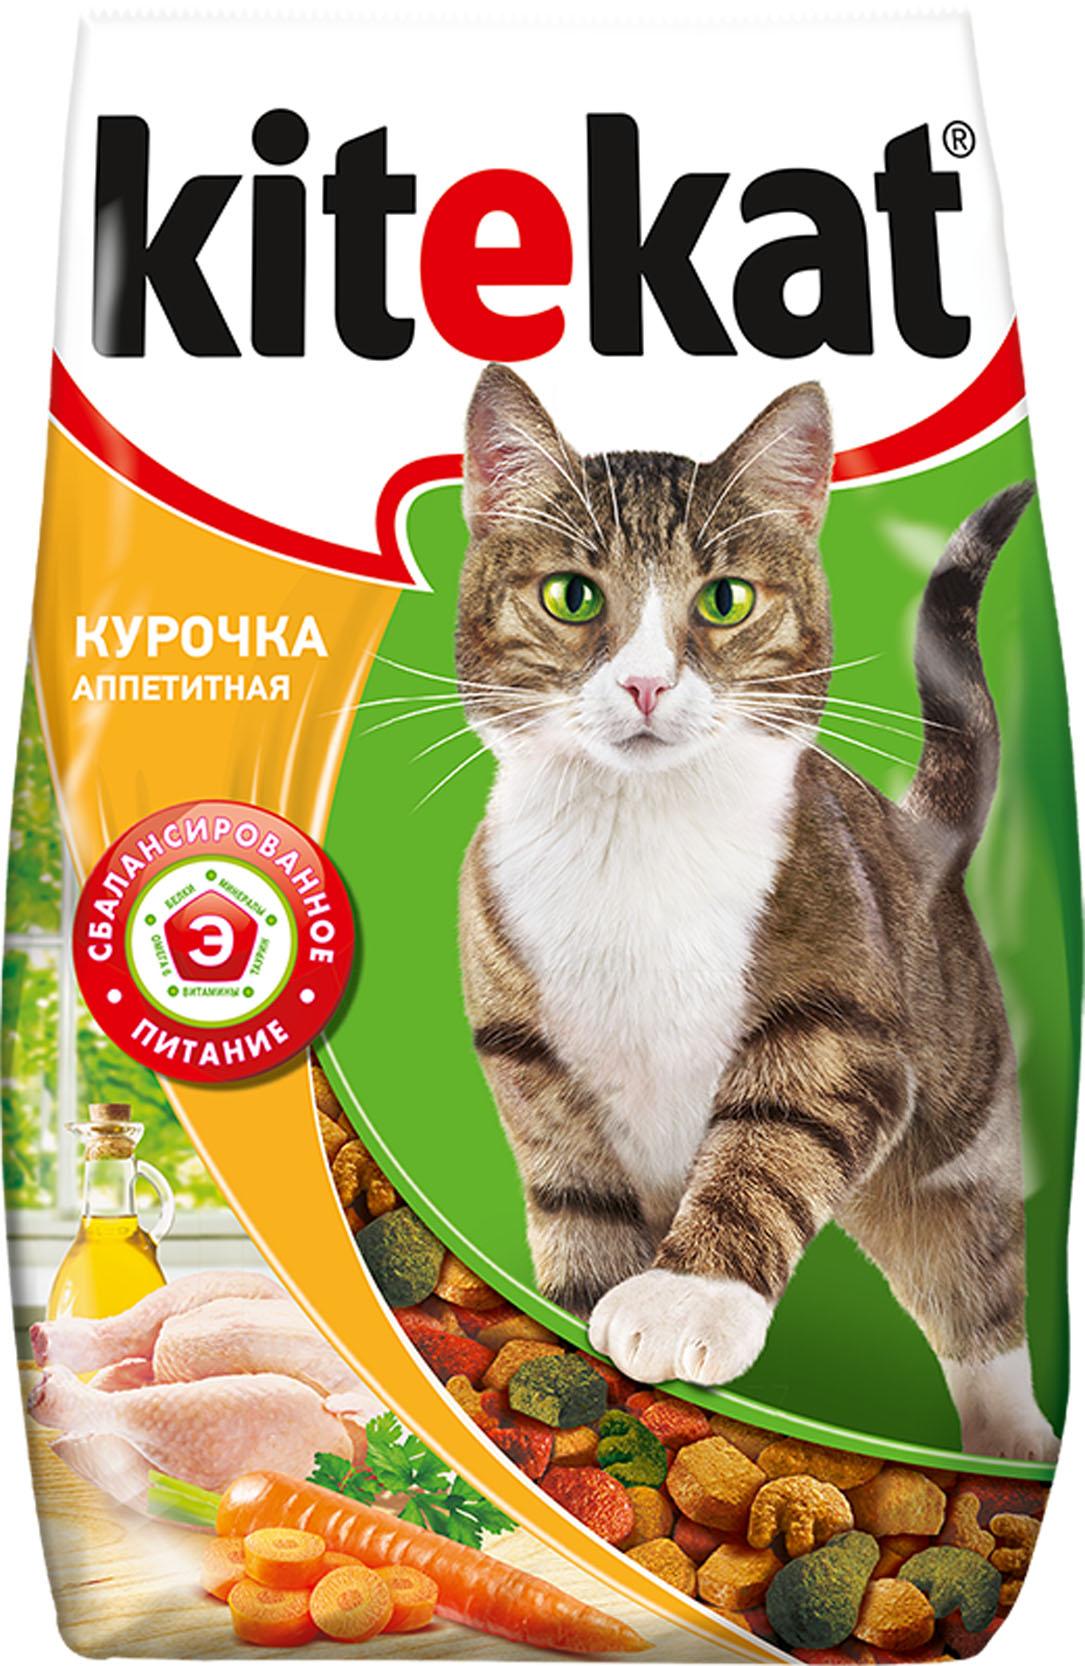 Корм сухой для взрослых кошек Kitekat, курочка аппетитная, 1,9 кг40431